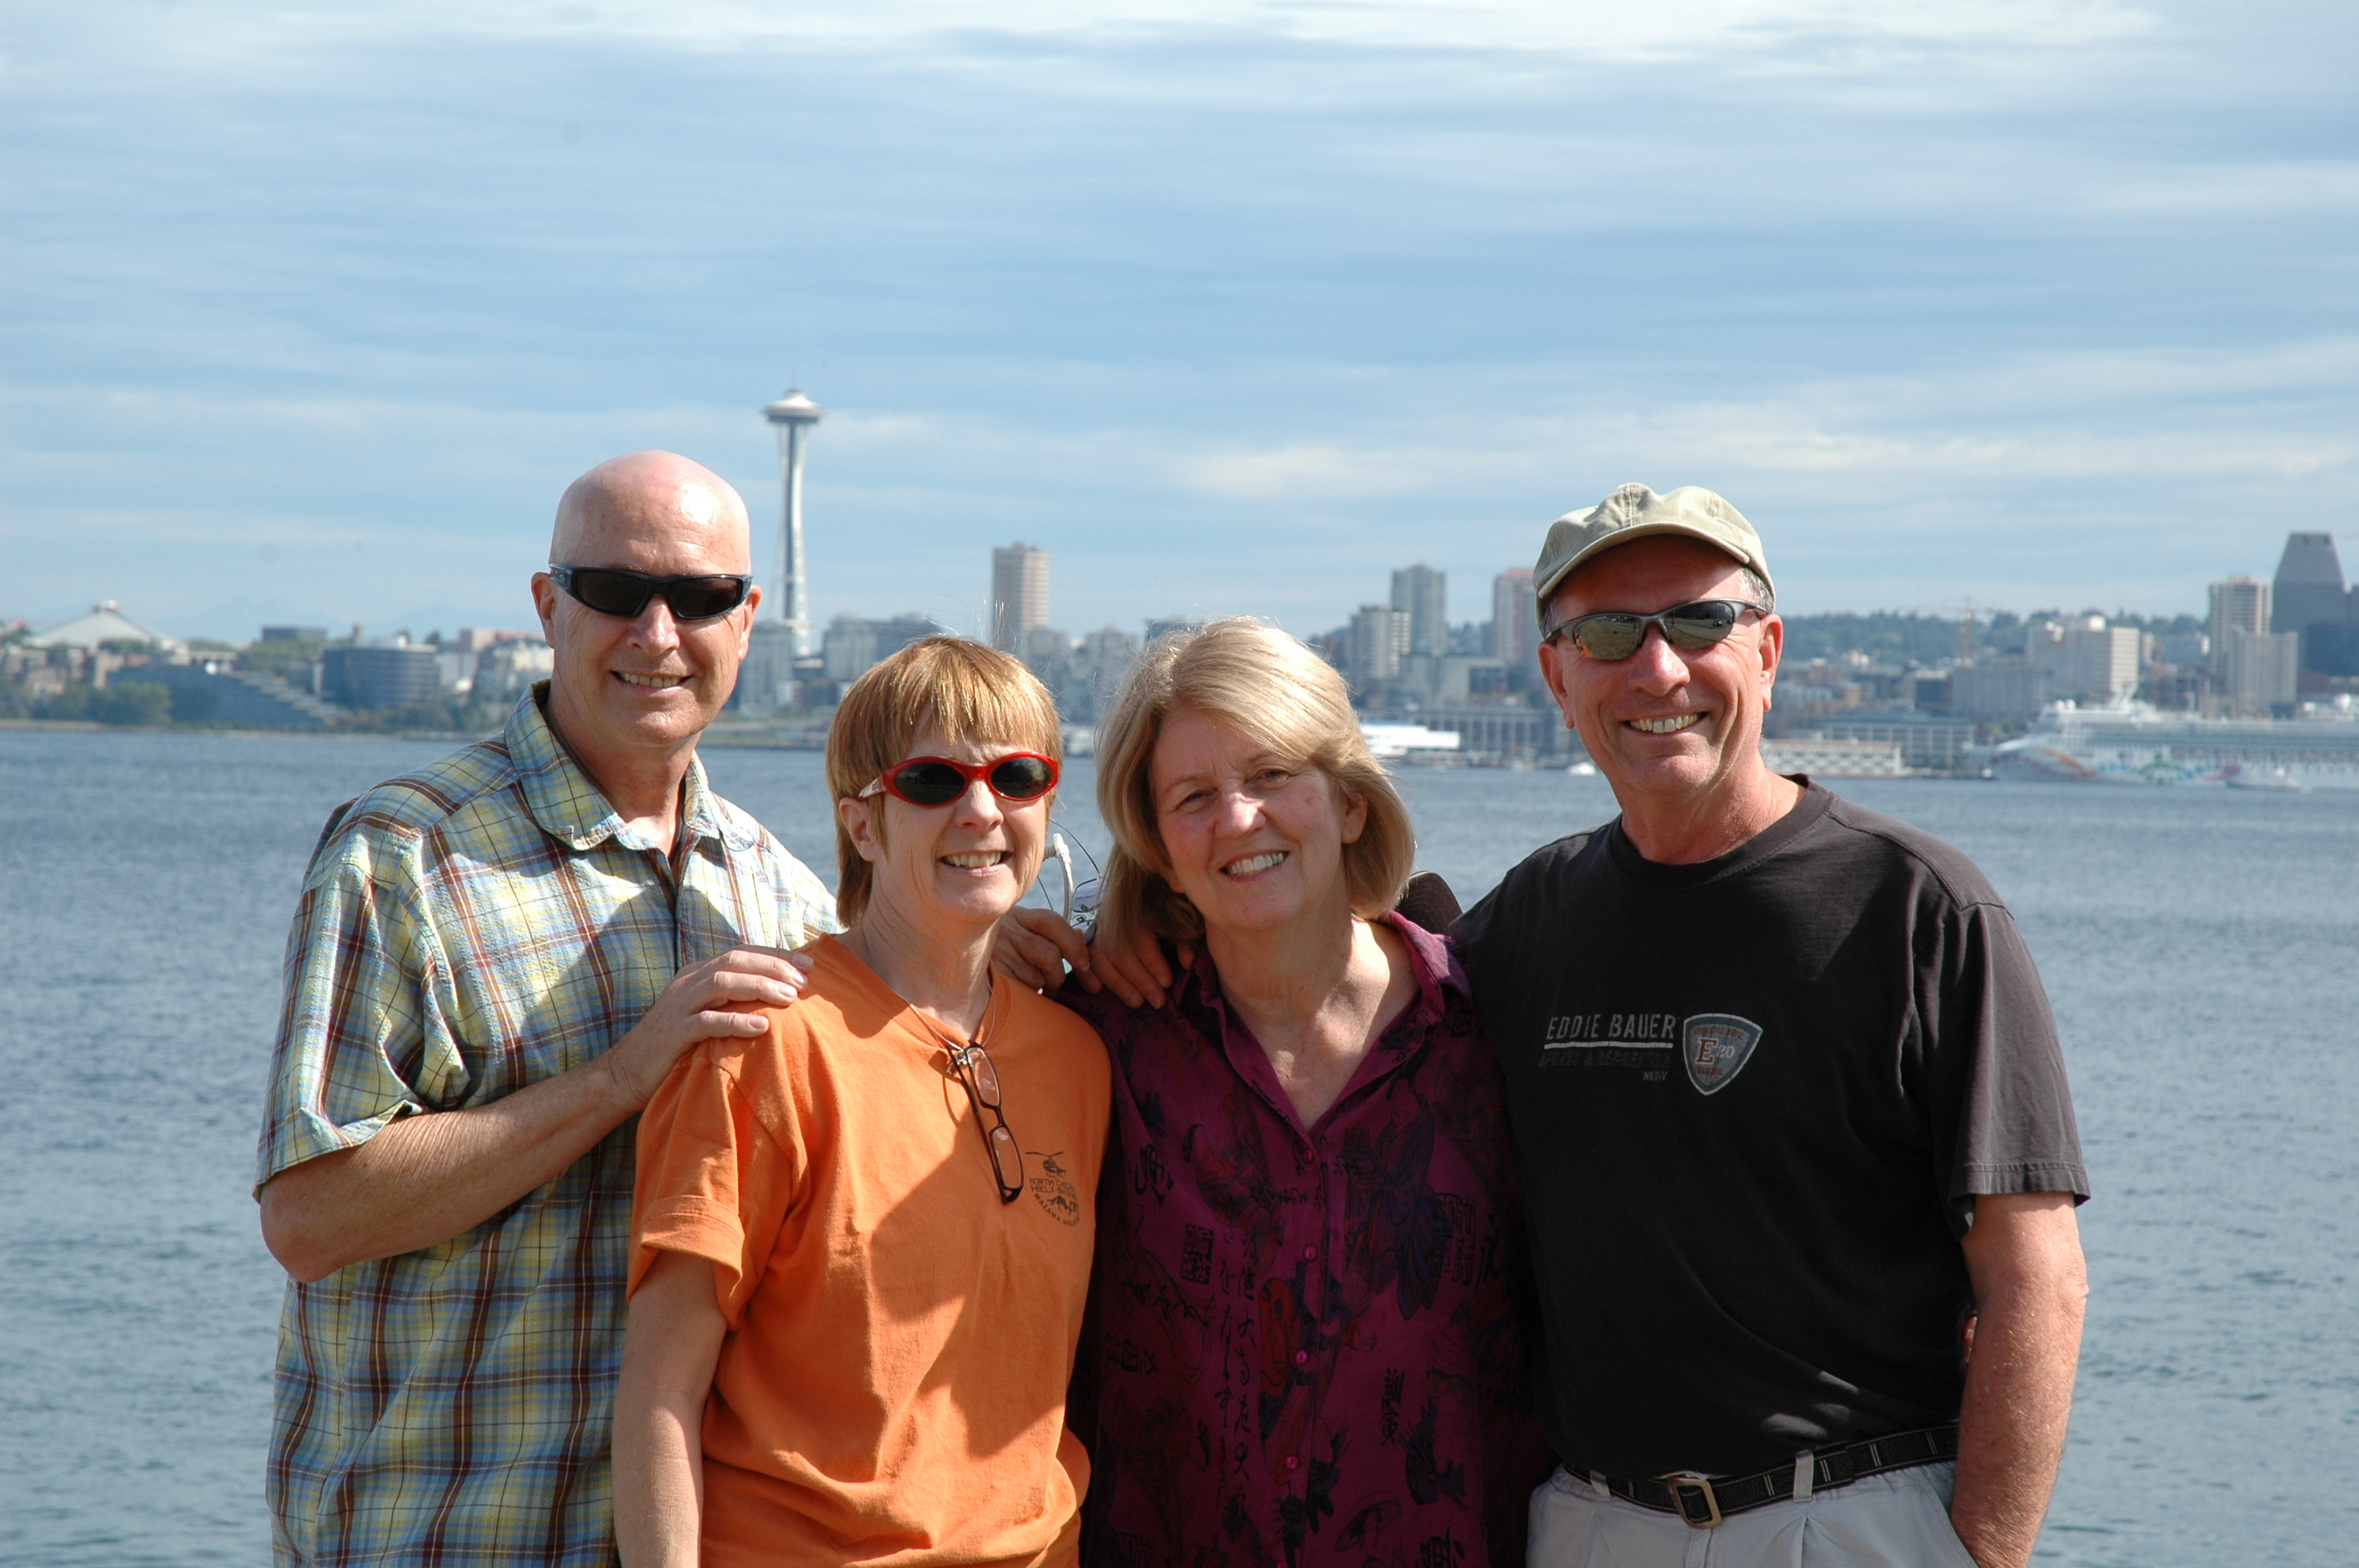 Me, Marilyn, Arlene, & Kevin